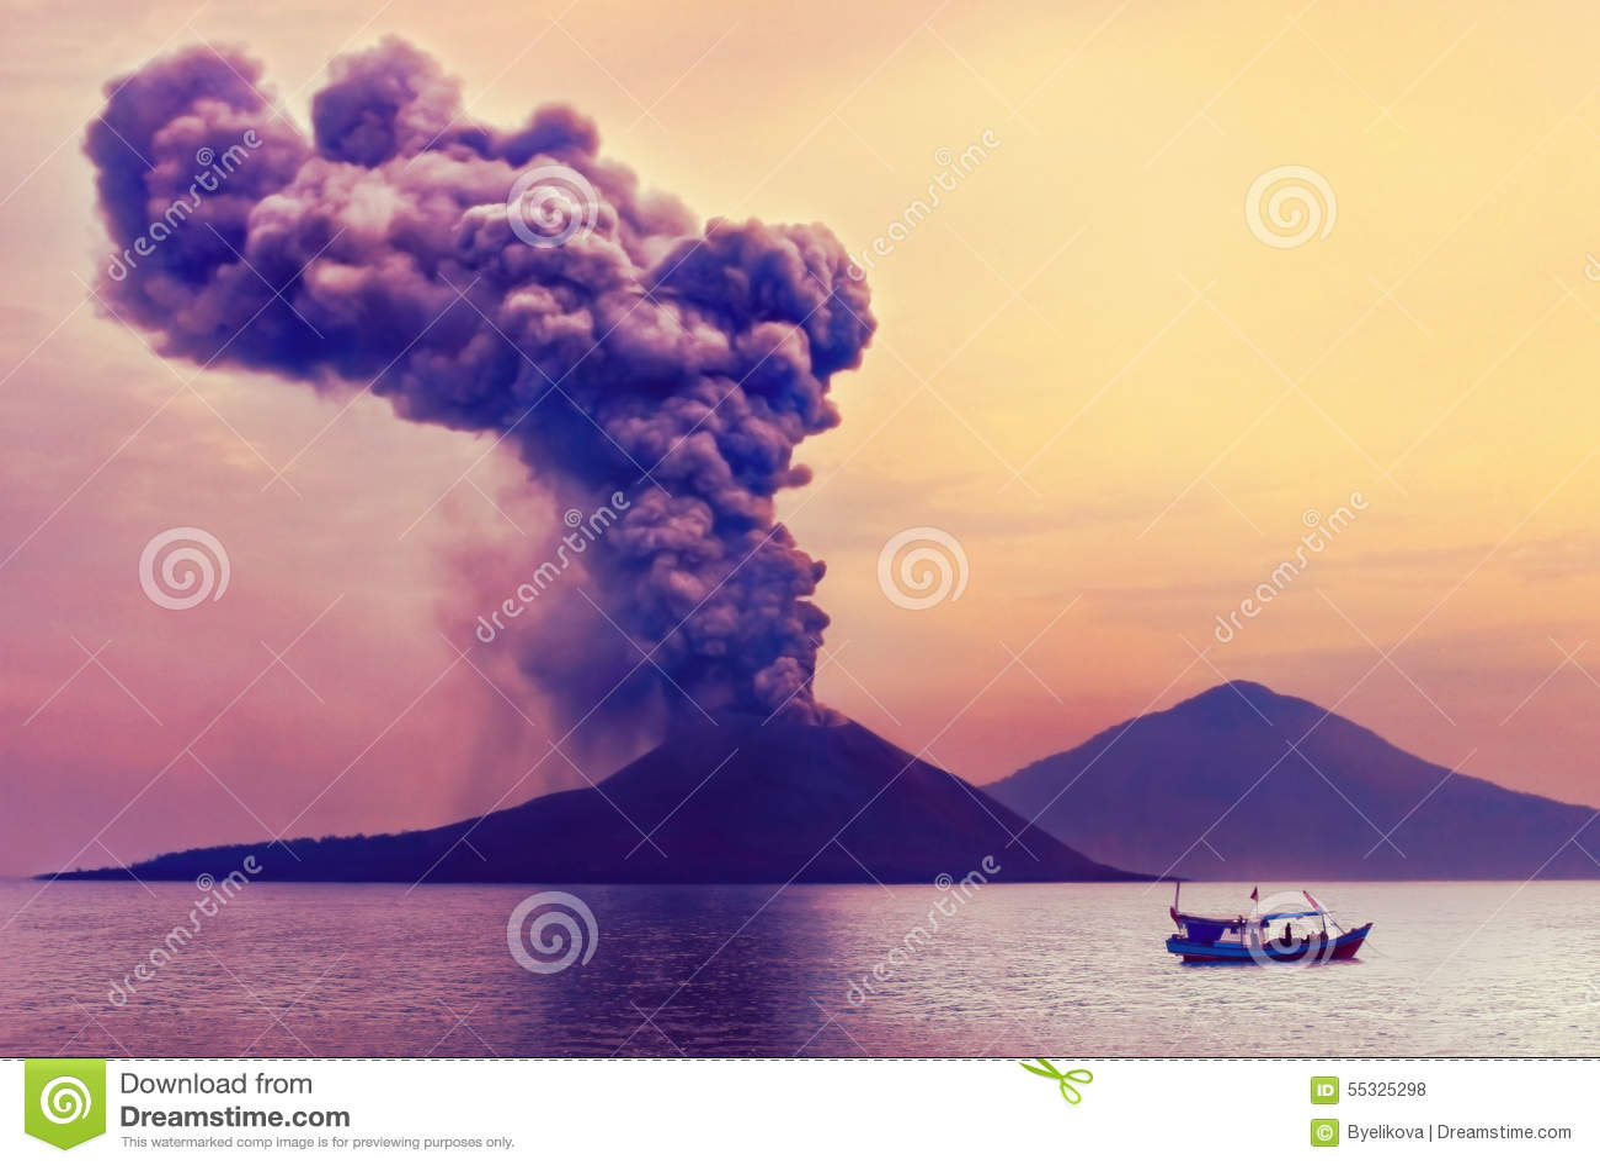 Anak爆发印度尼西亚krakatau火山